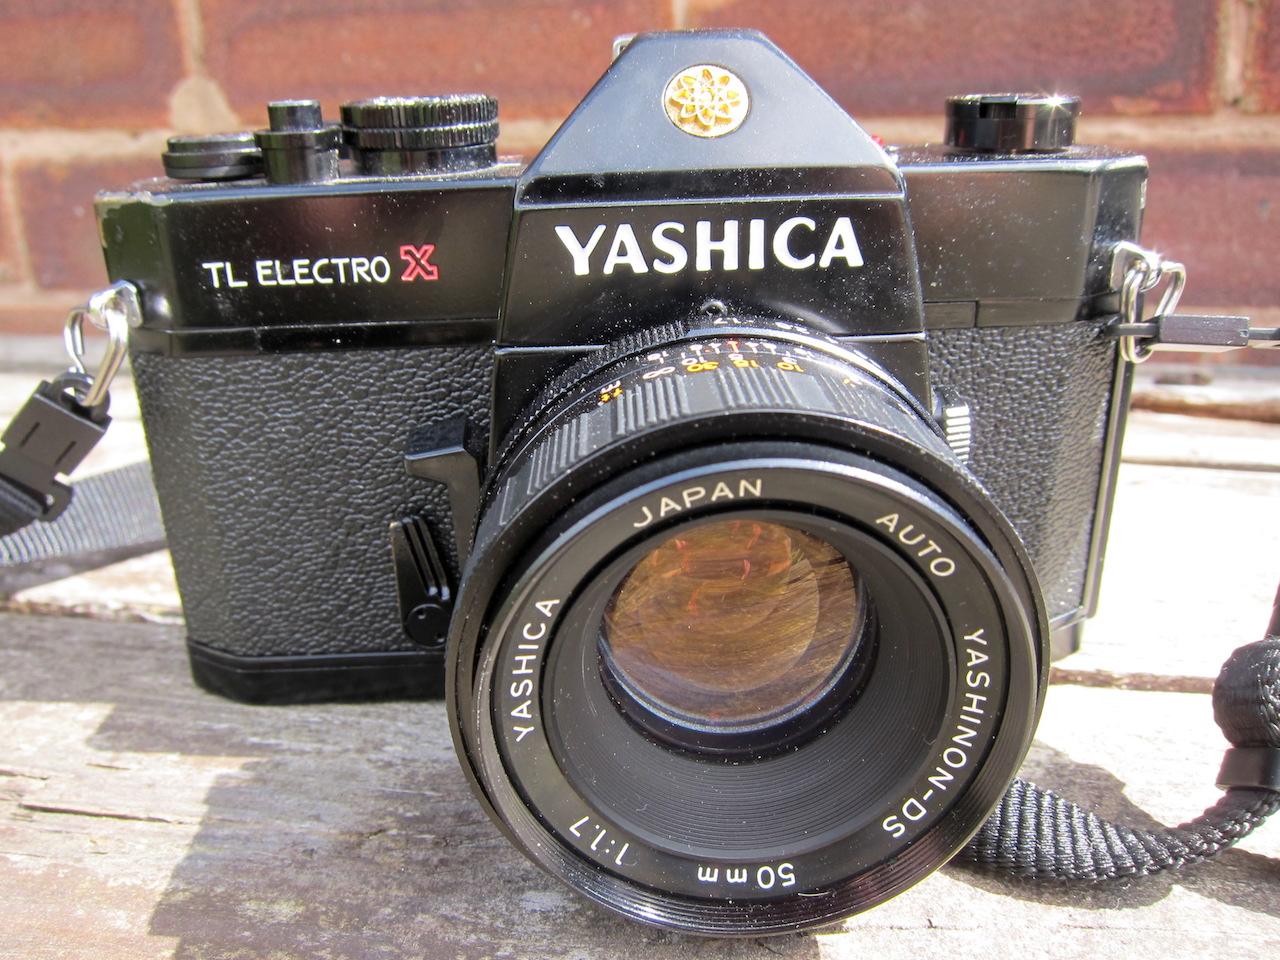 Yashica TL ElectroX